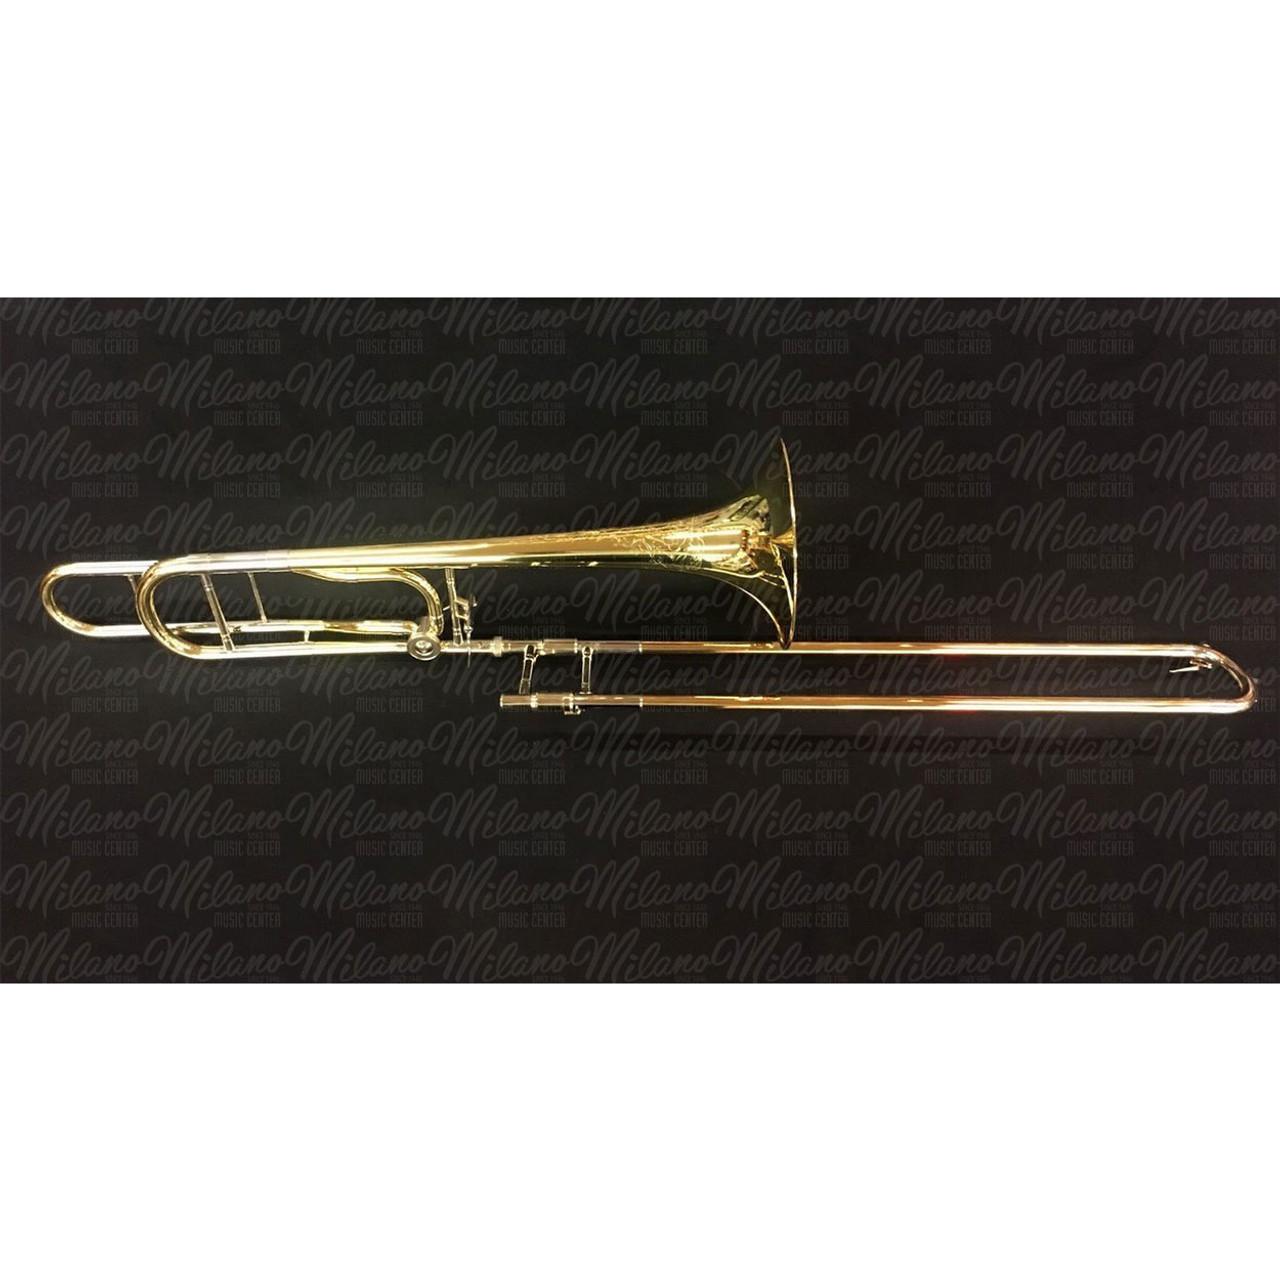 Conn 88HYO Tenor Trombone - Milano Music Center